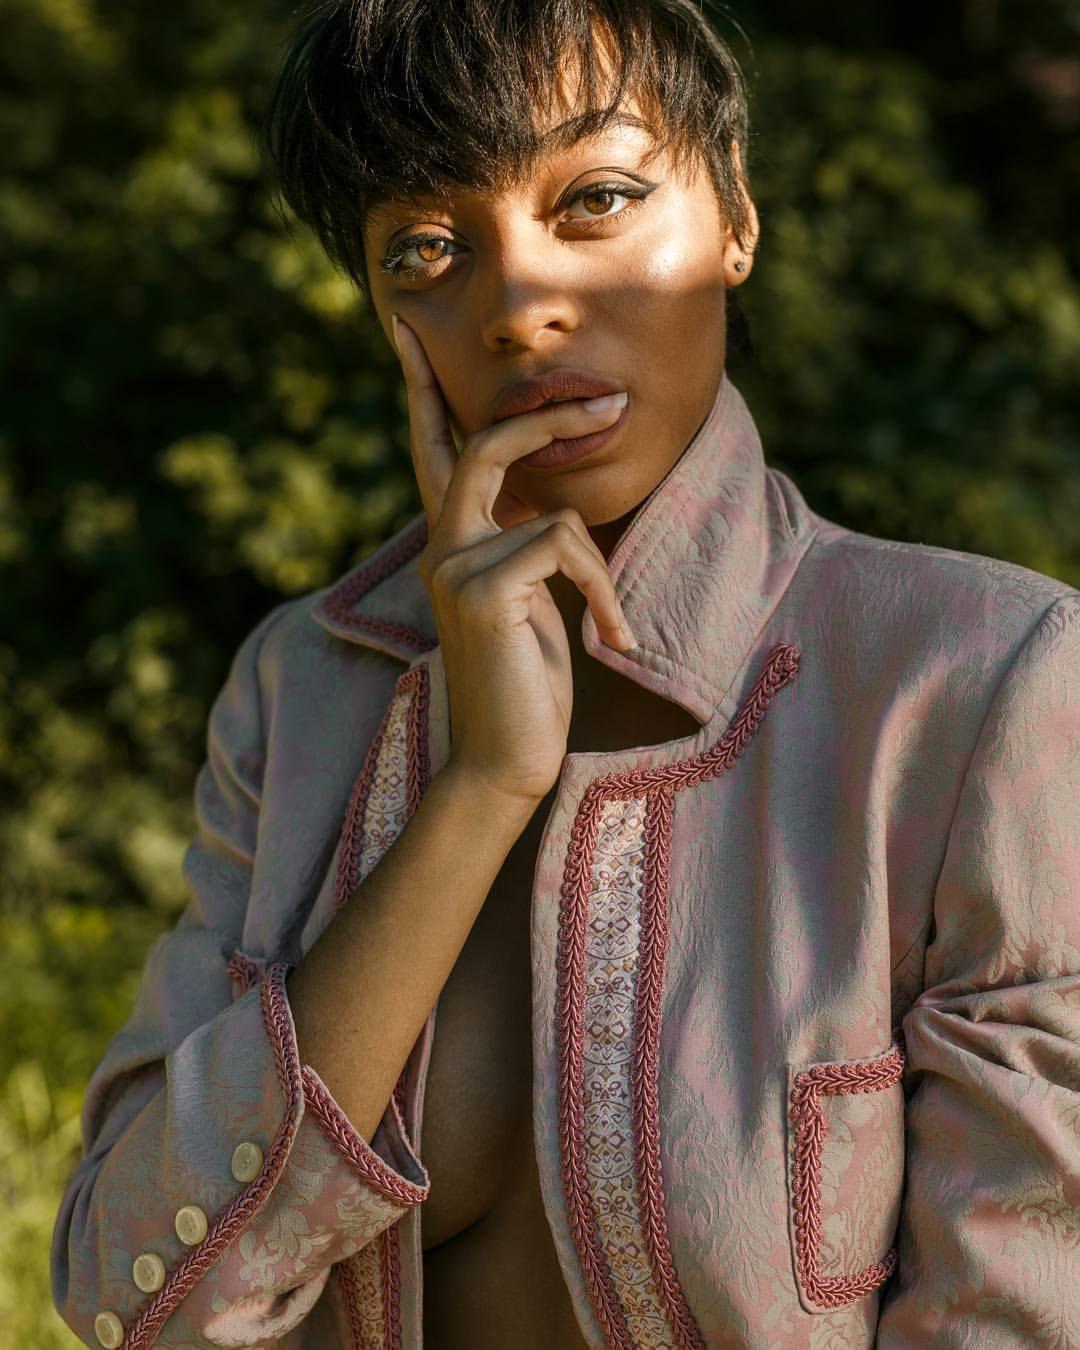 Seraphina Russell's Model portfolio